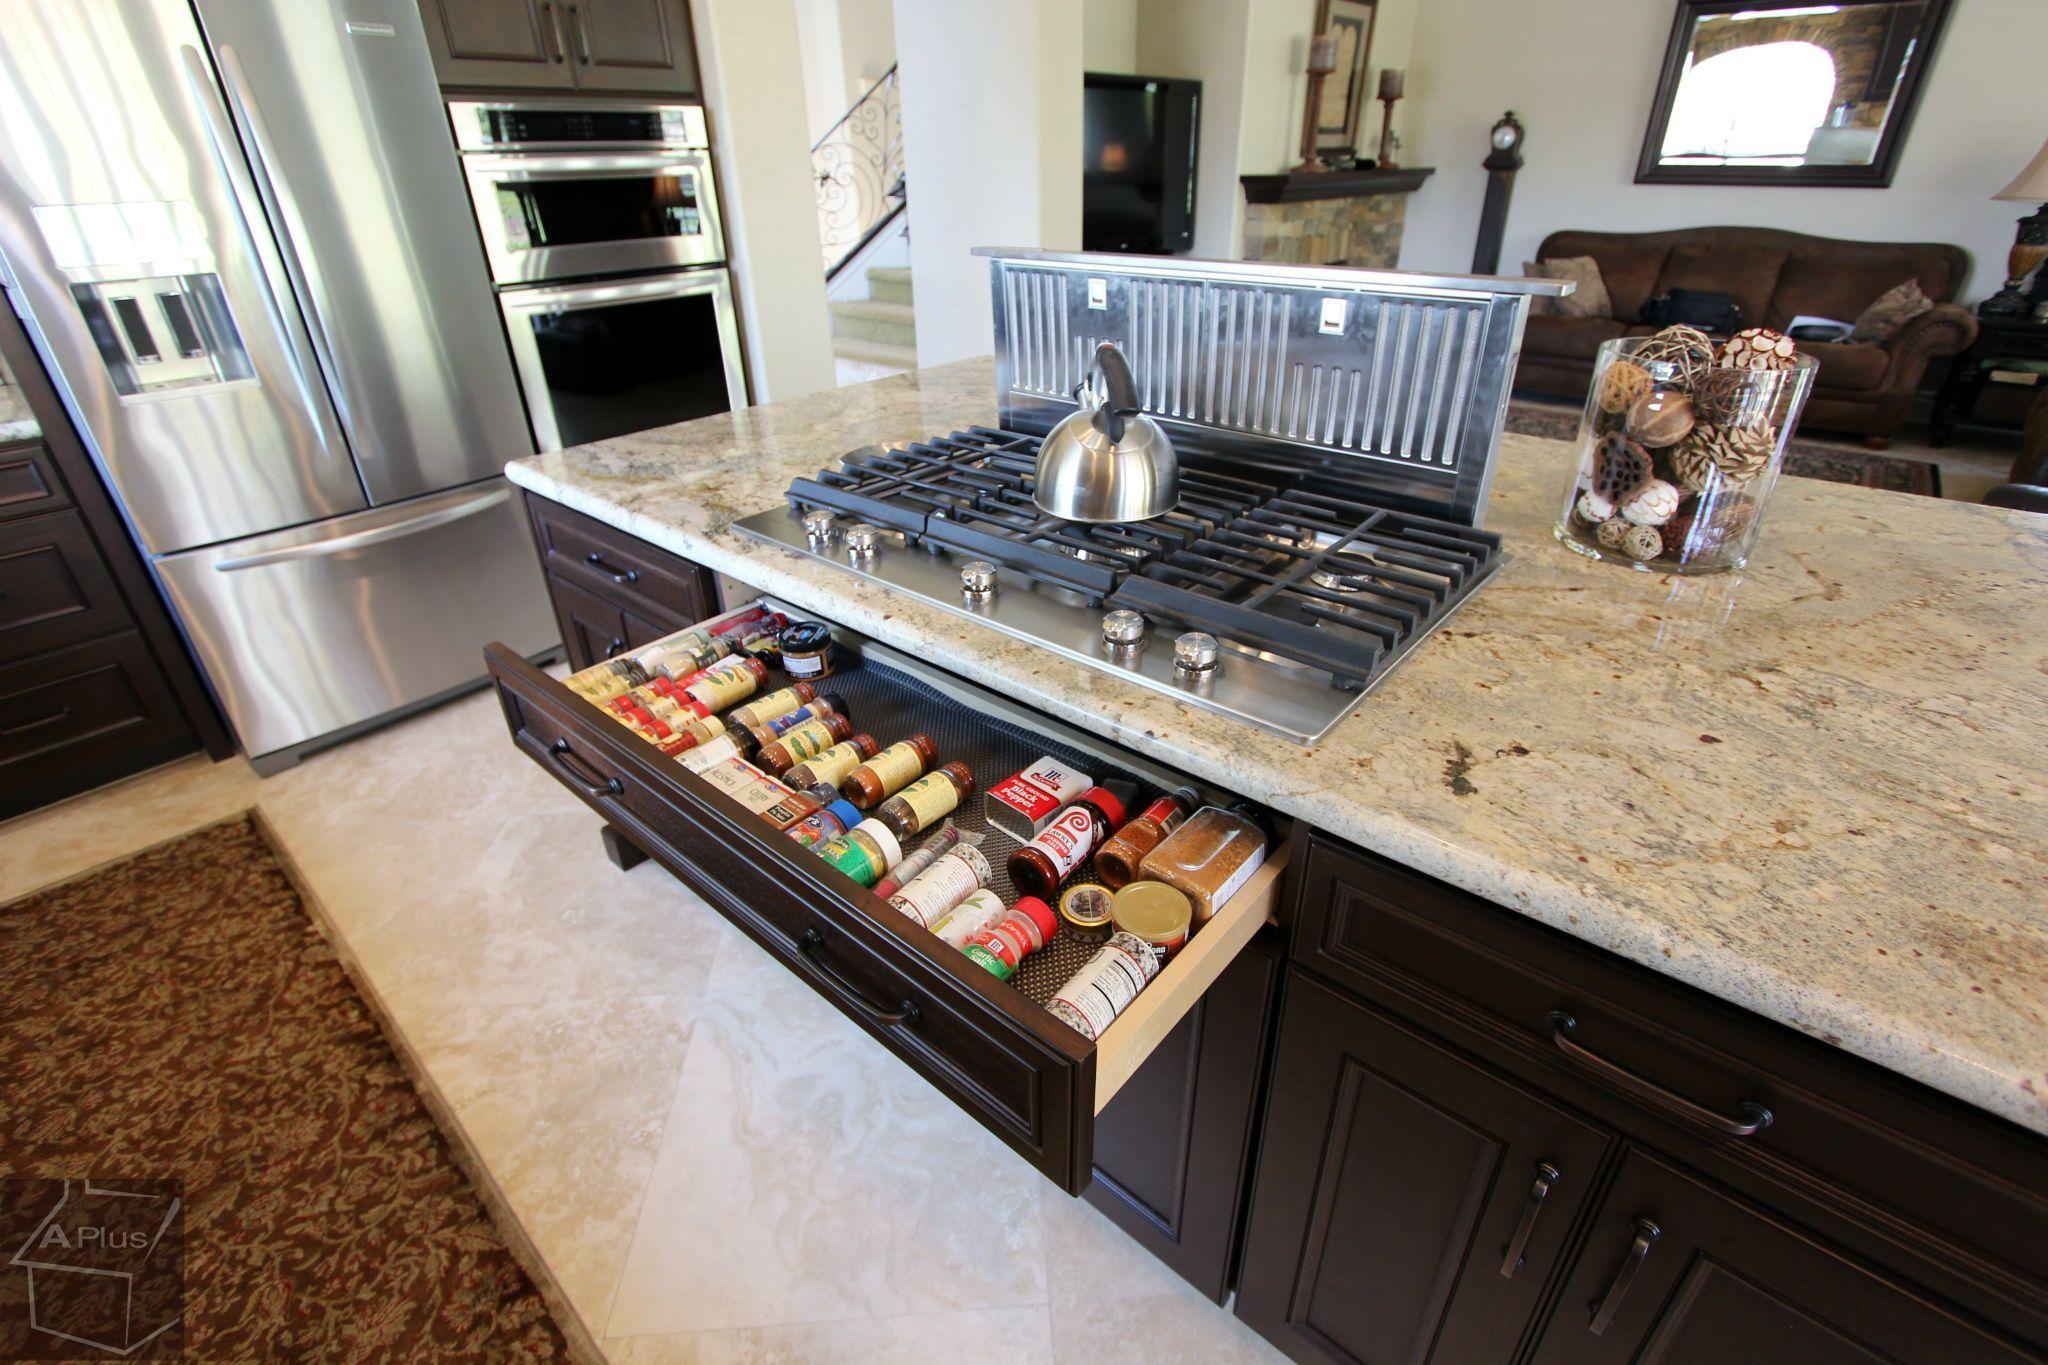 Kitchen Designer Orange County Entrancing Design Build Traditional #kitchenremodel With #customcabinets Review